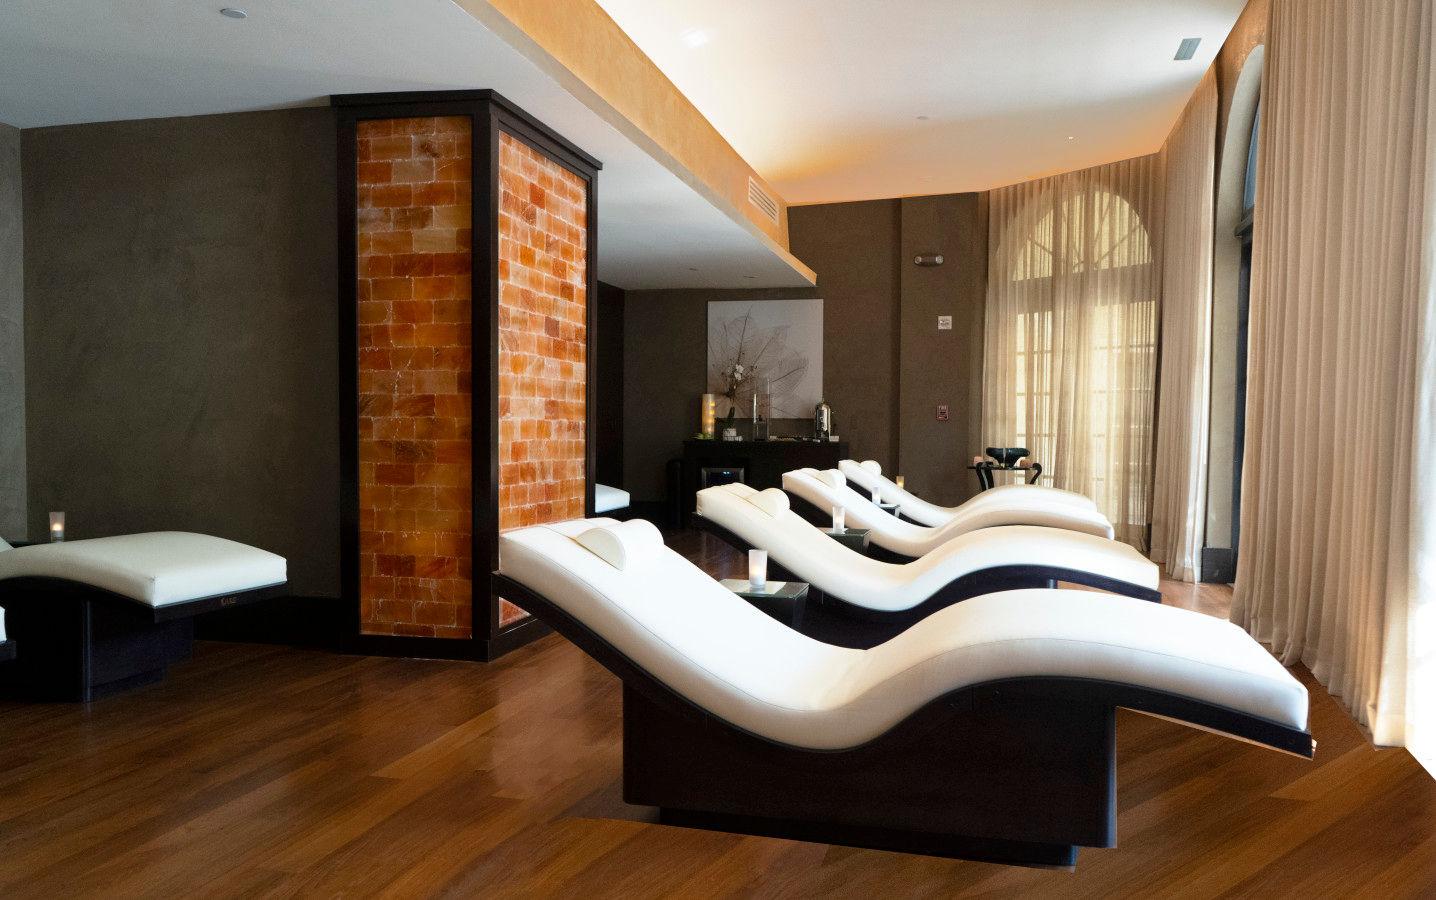 Relaxation Lounge with Himalayan Salt Wall